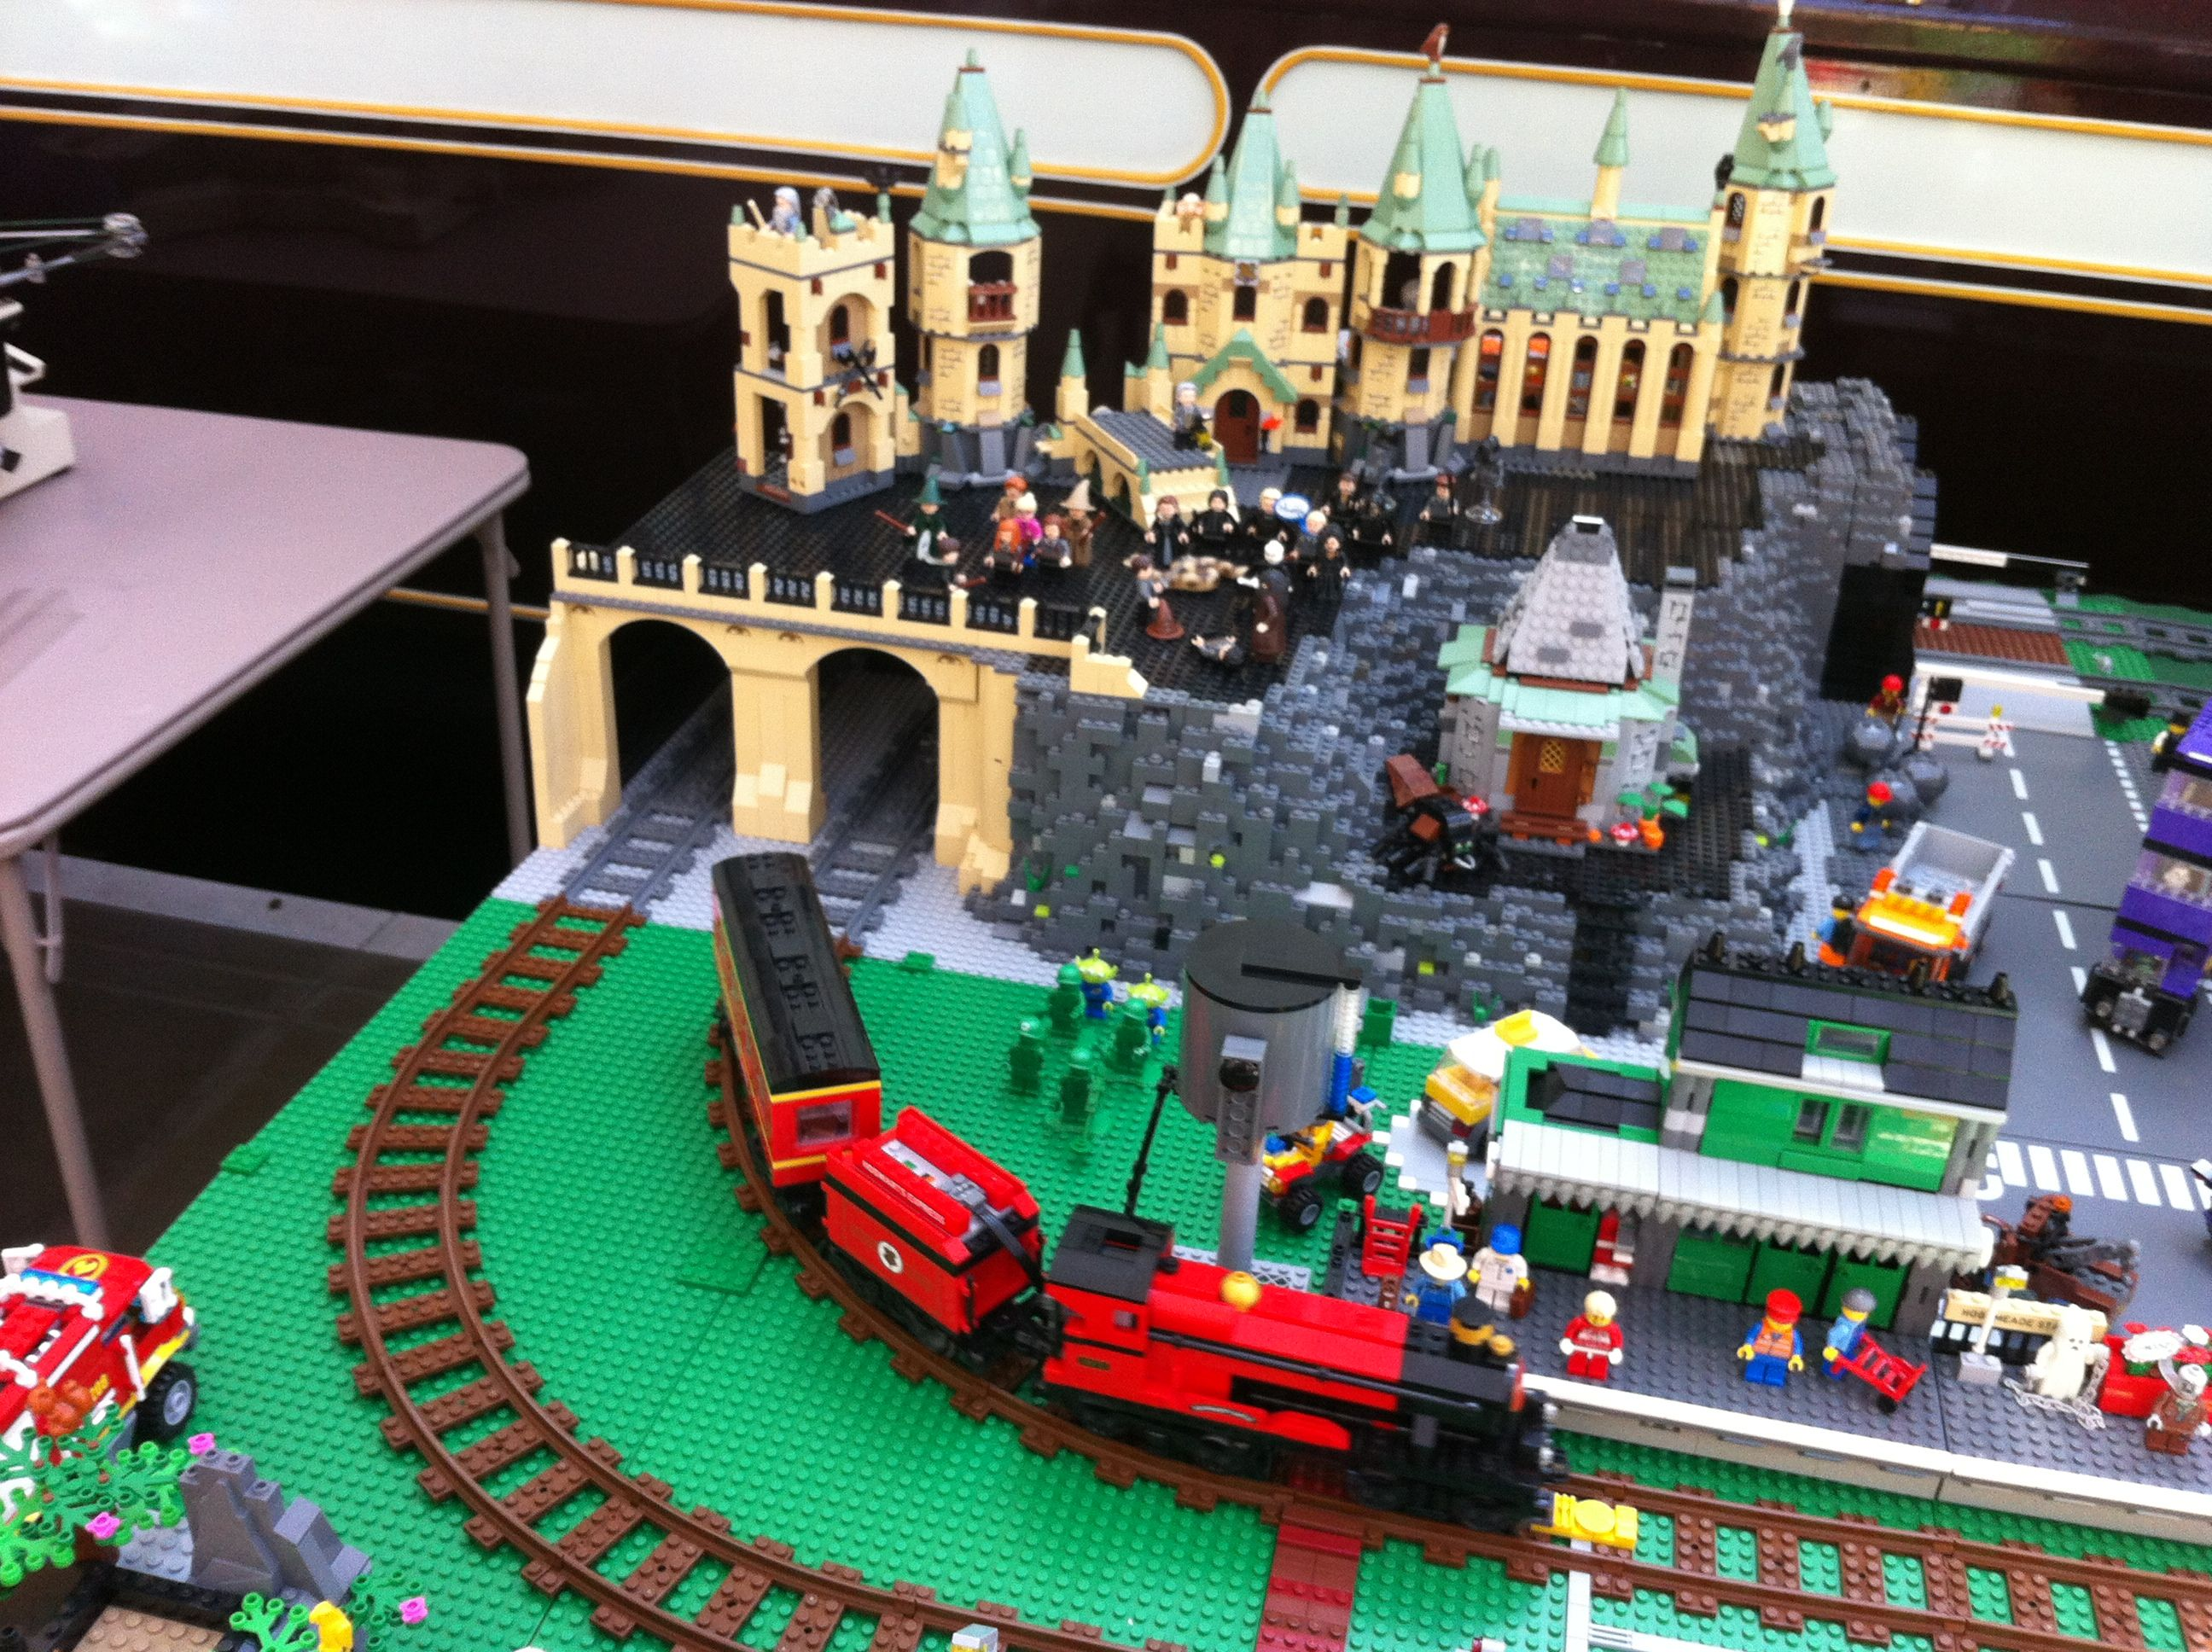 Lego Hogwarts Express Lego Hogwarts Lego Playroom Lego